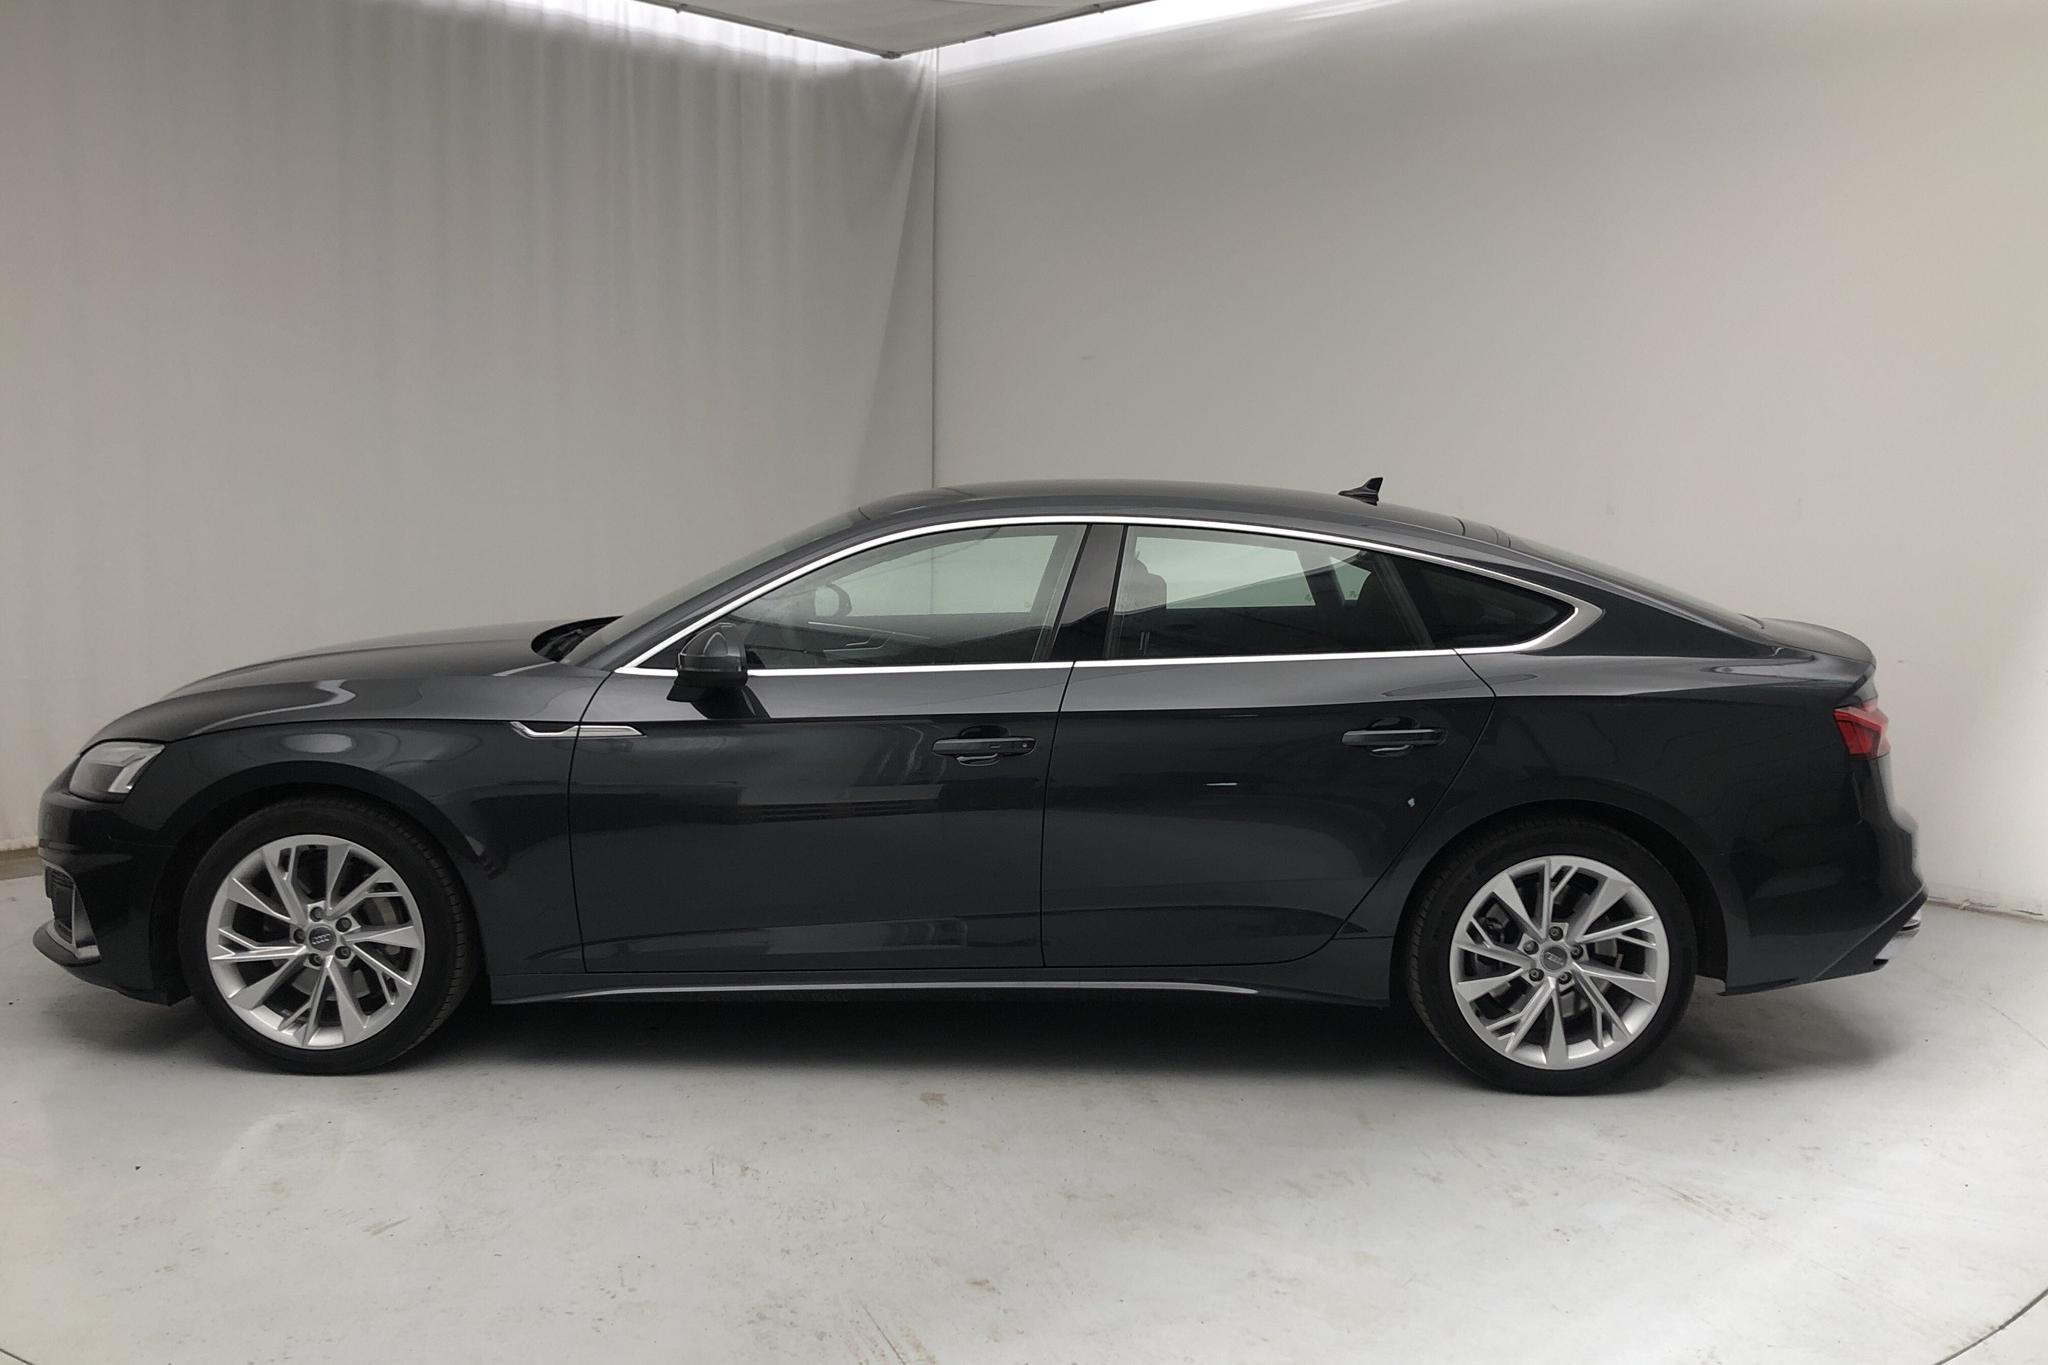 Audi A5 Sportback 45 TFSI quattro LCI (265hk) - 353 mil - Automat - grå - 2021